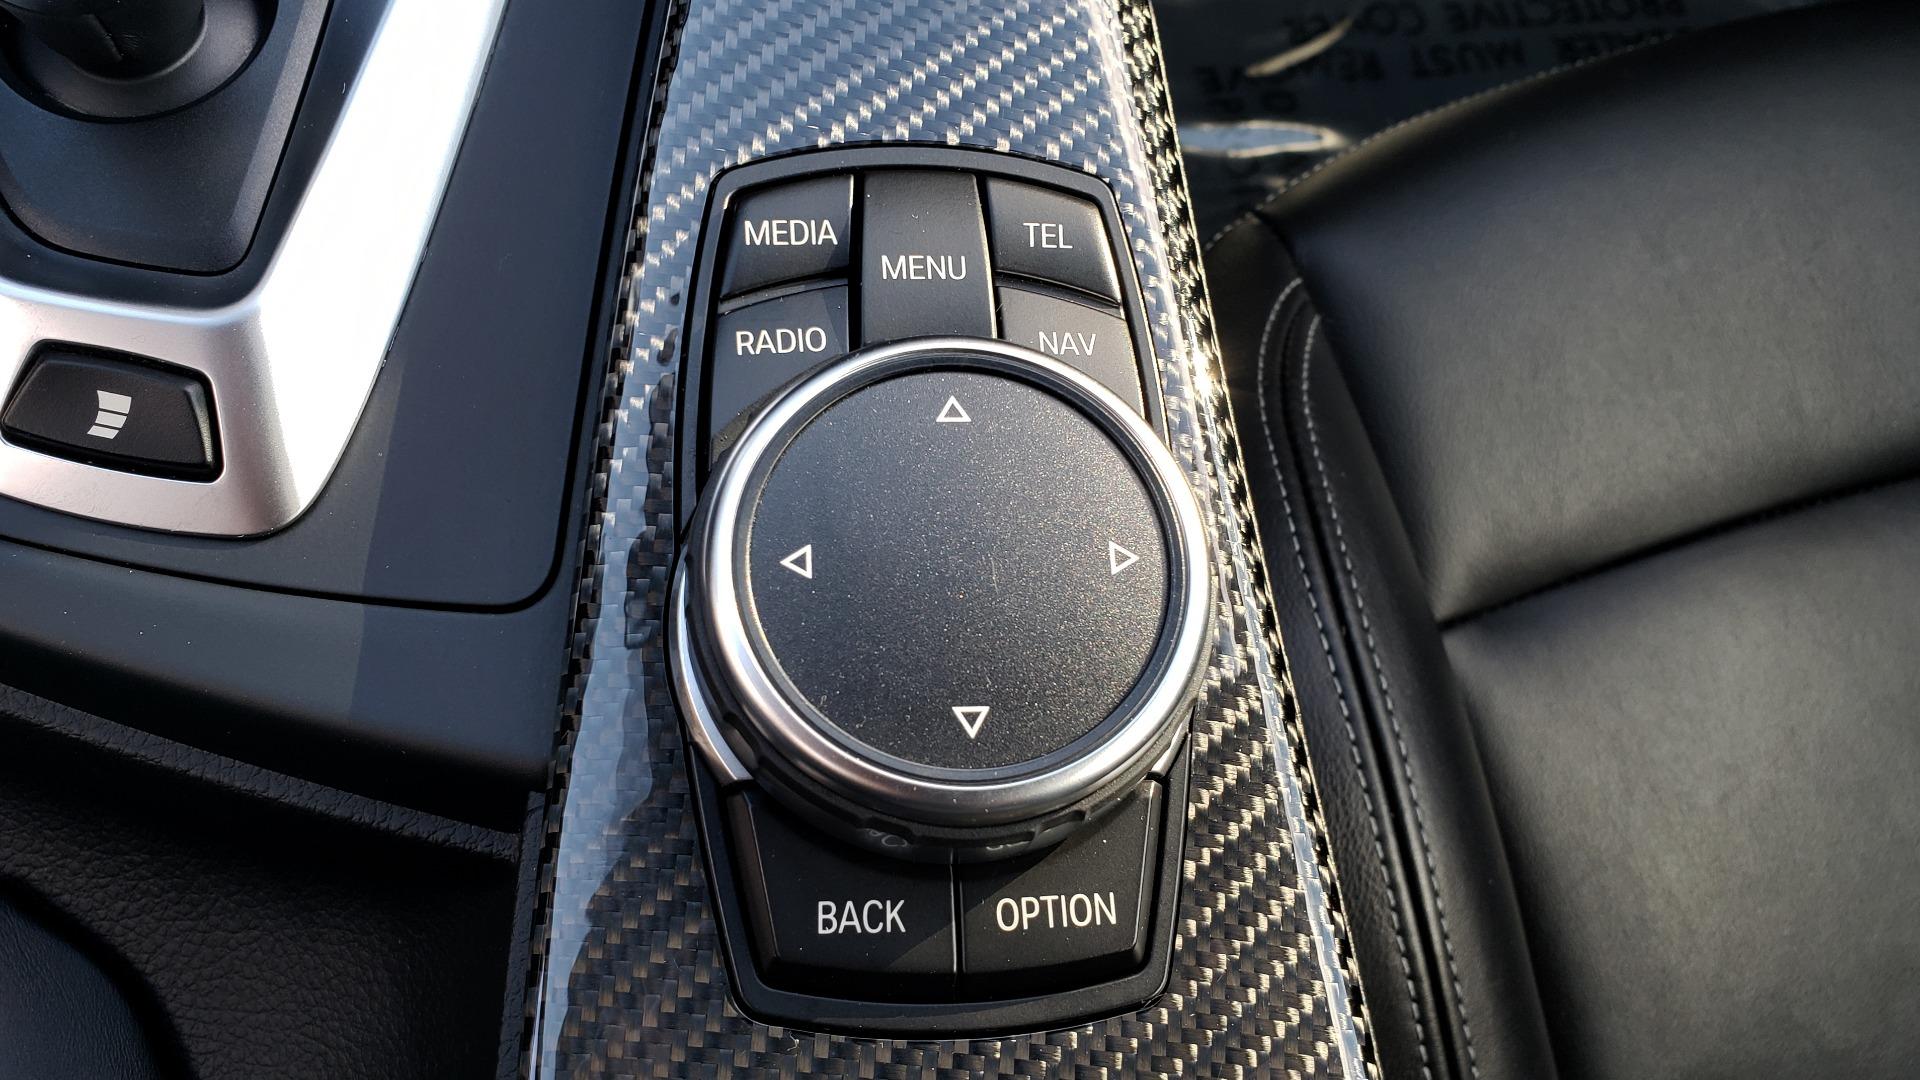 Used 2015 BMW M4 COUPE / EXEC PKG / DRVR ASST PLUS / LIGHTING / M-SUSPENSION for sale Sold at Formula Imports in Charlotte NC 28227 58